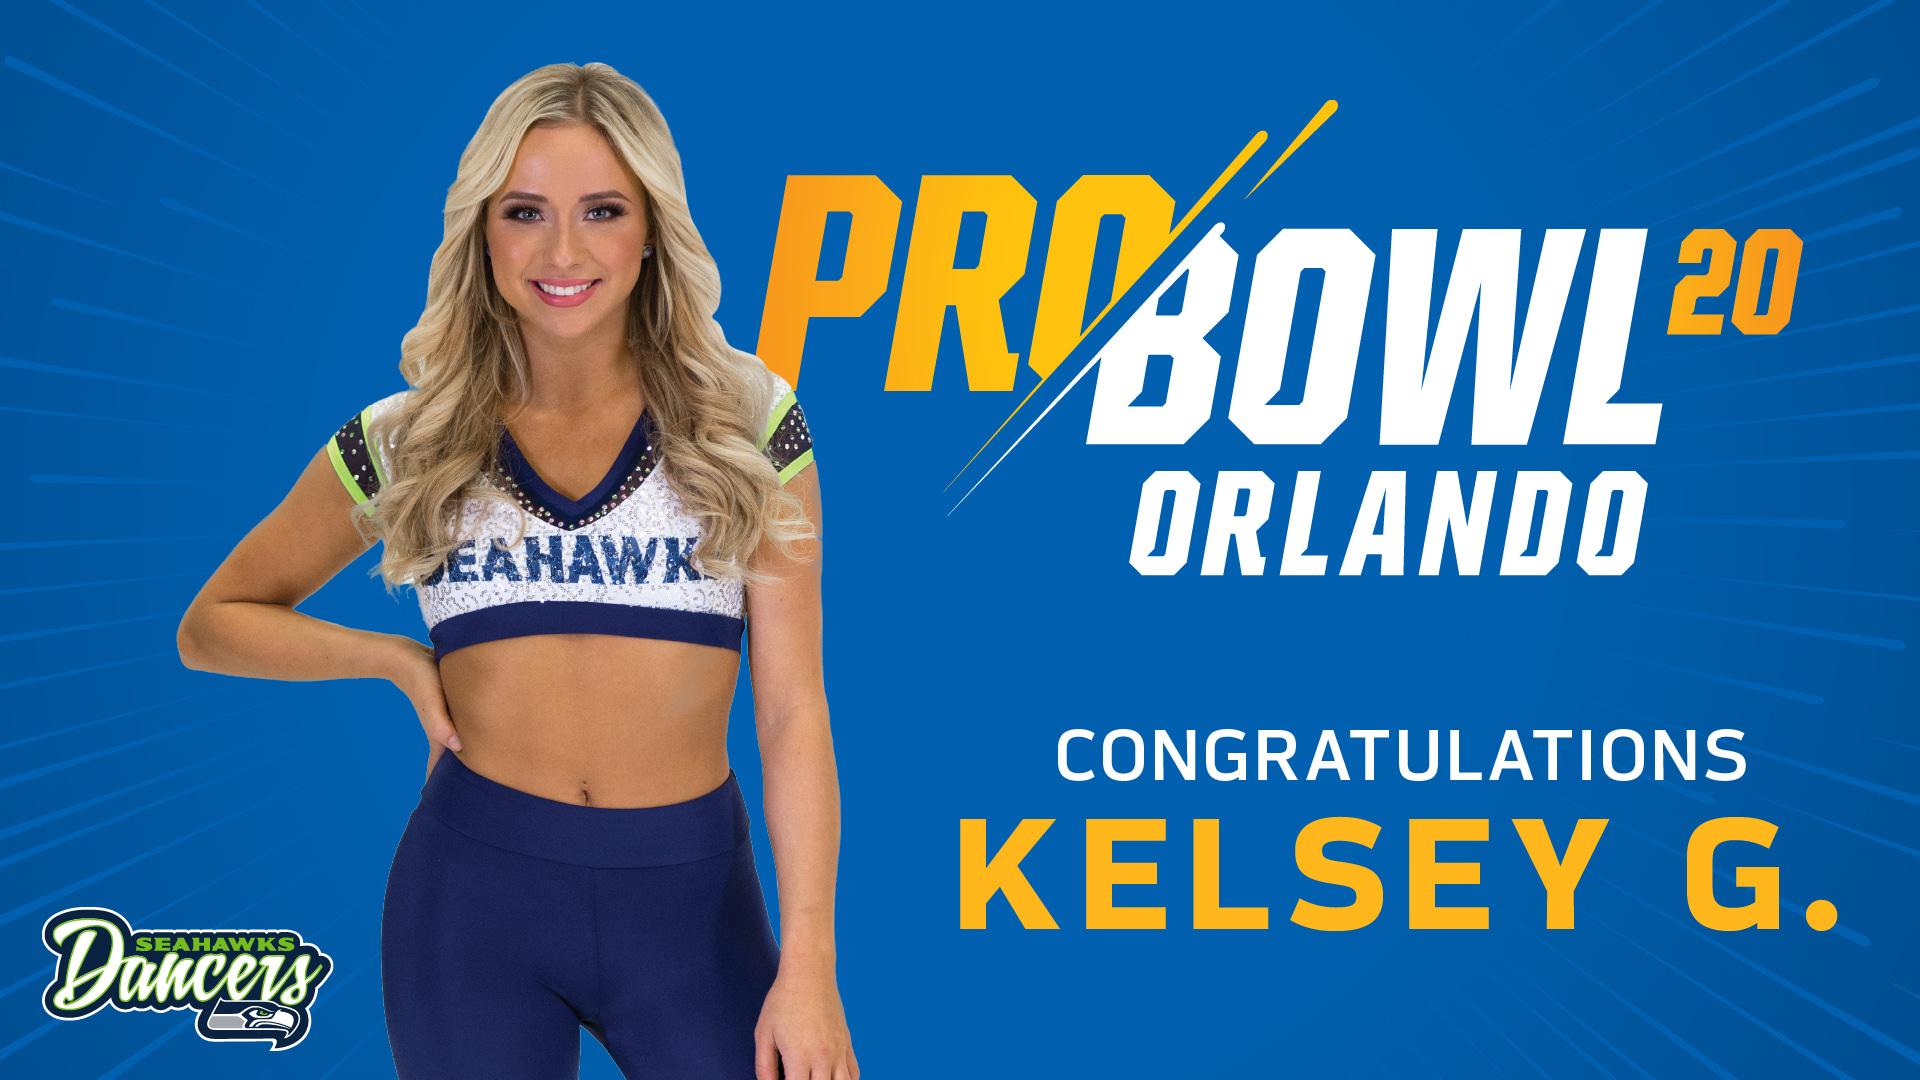 Congratulations Kelsey G.!